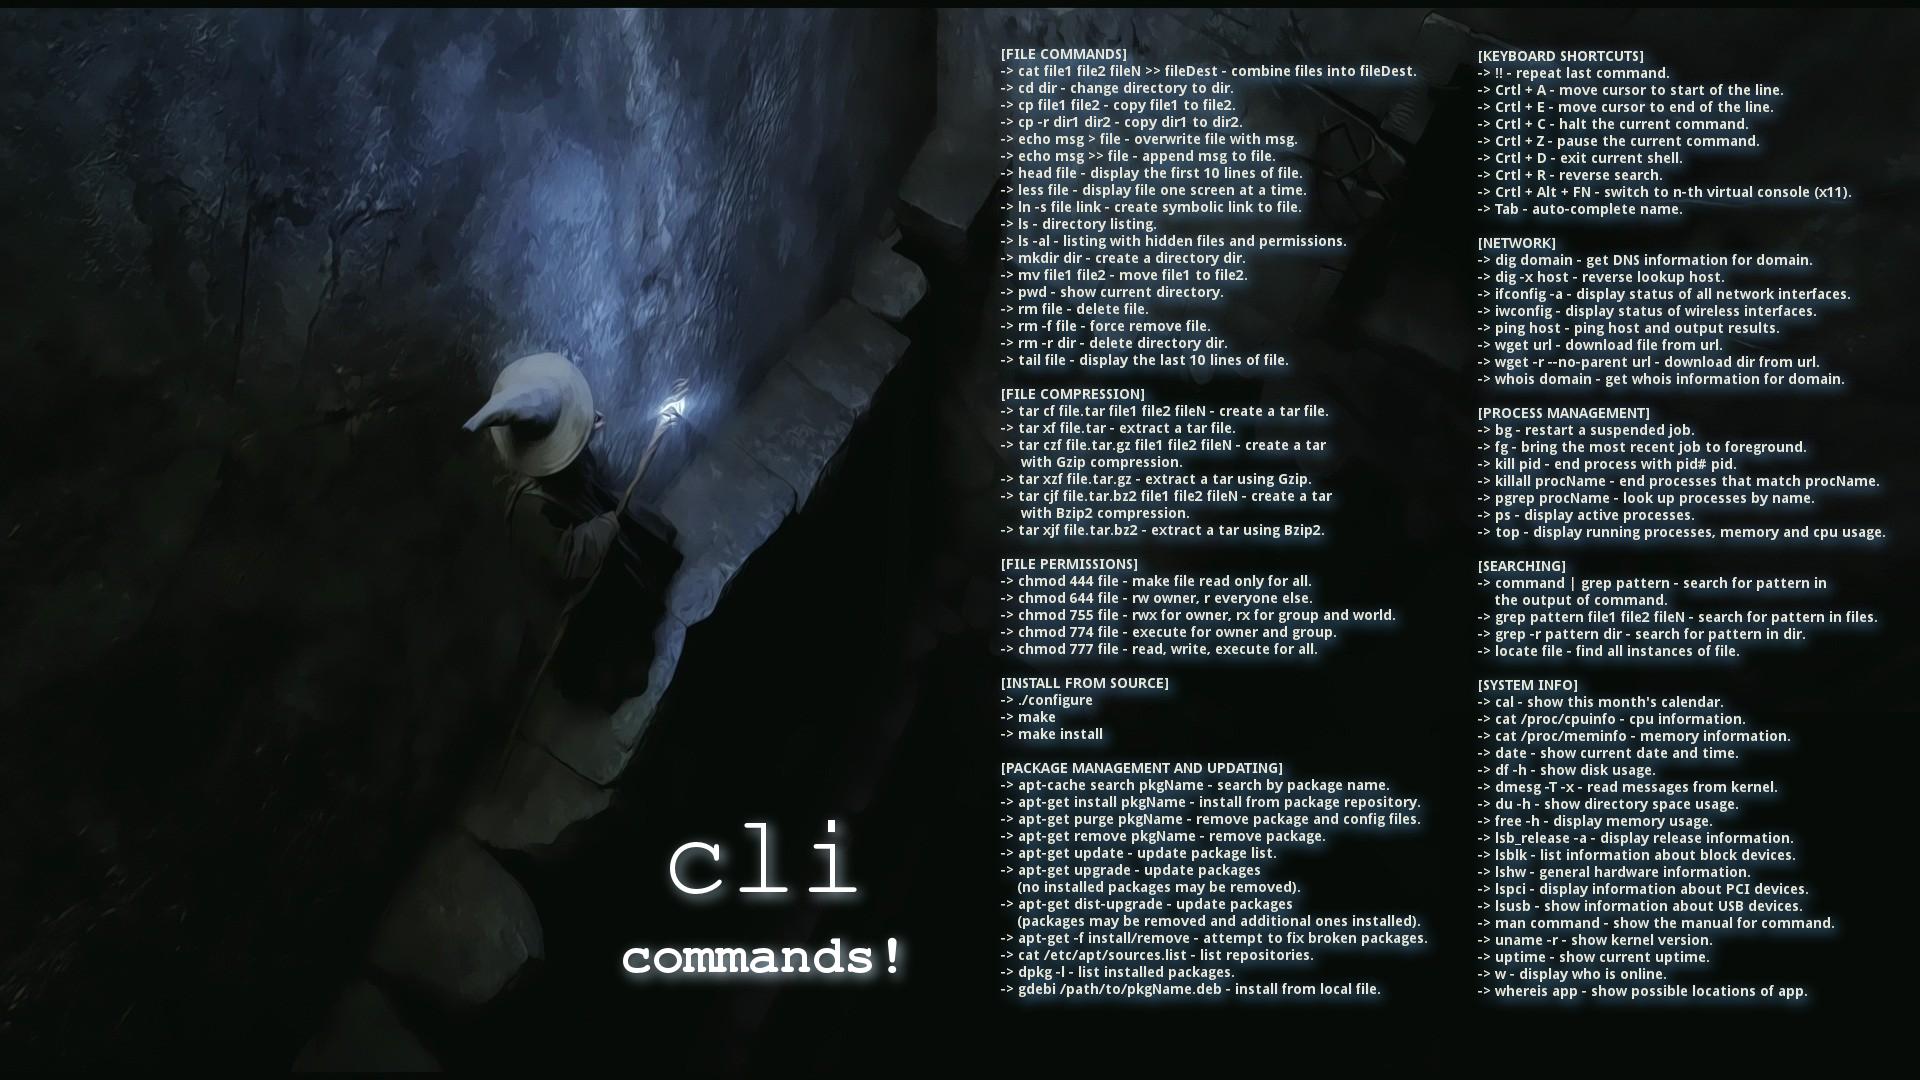 Wallpaper : command lines, Ubuntu, Gandalf, Debian, Unix